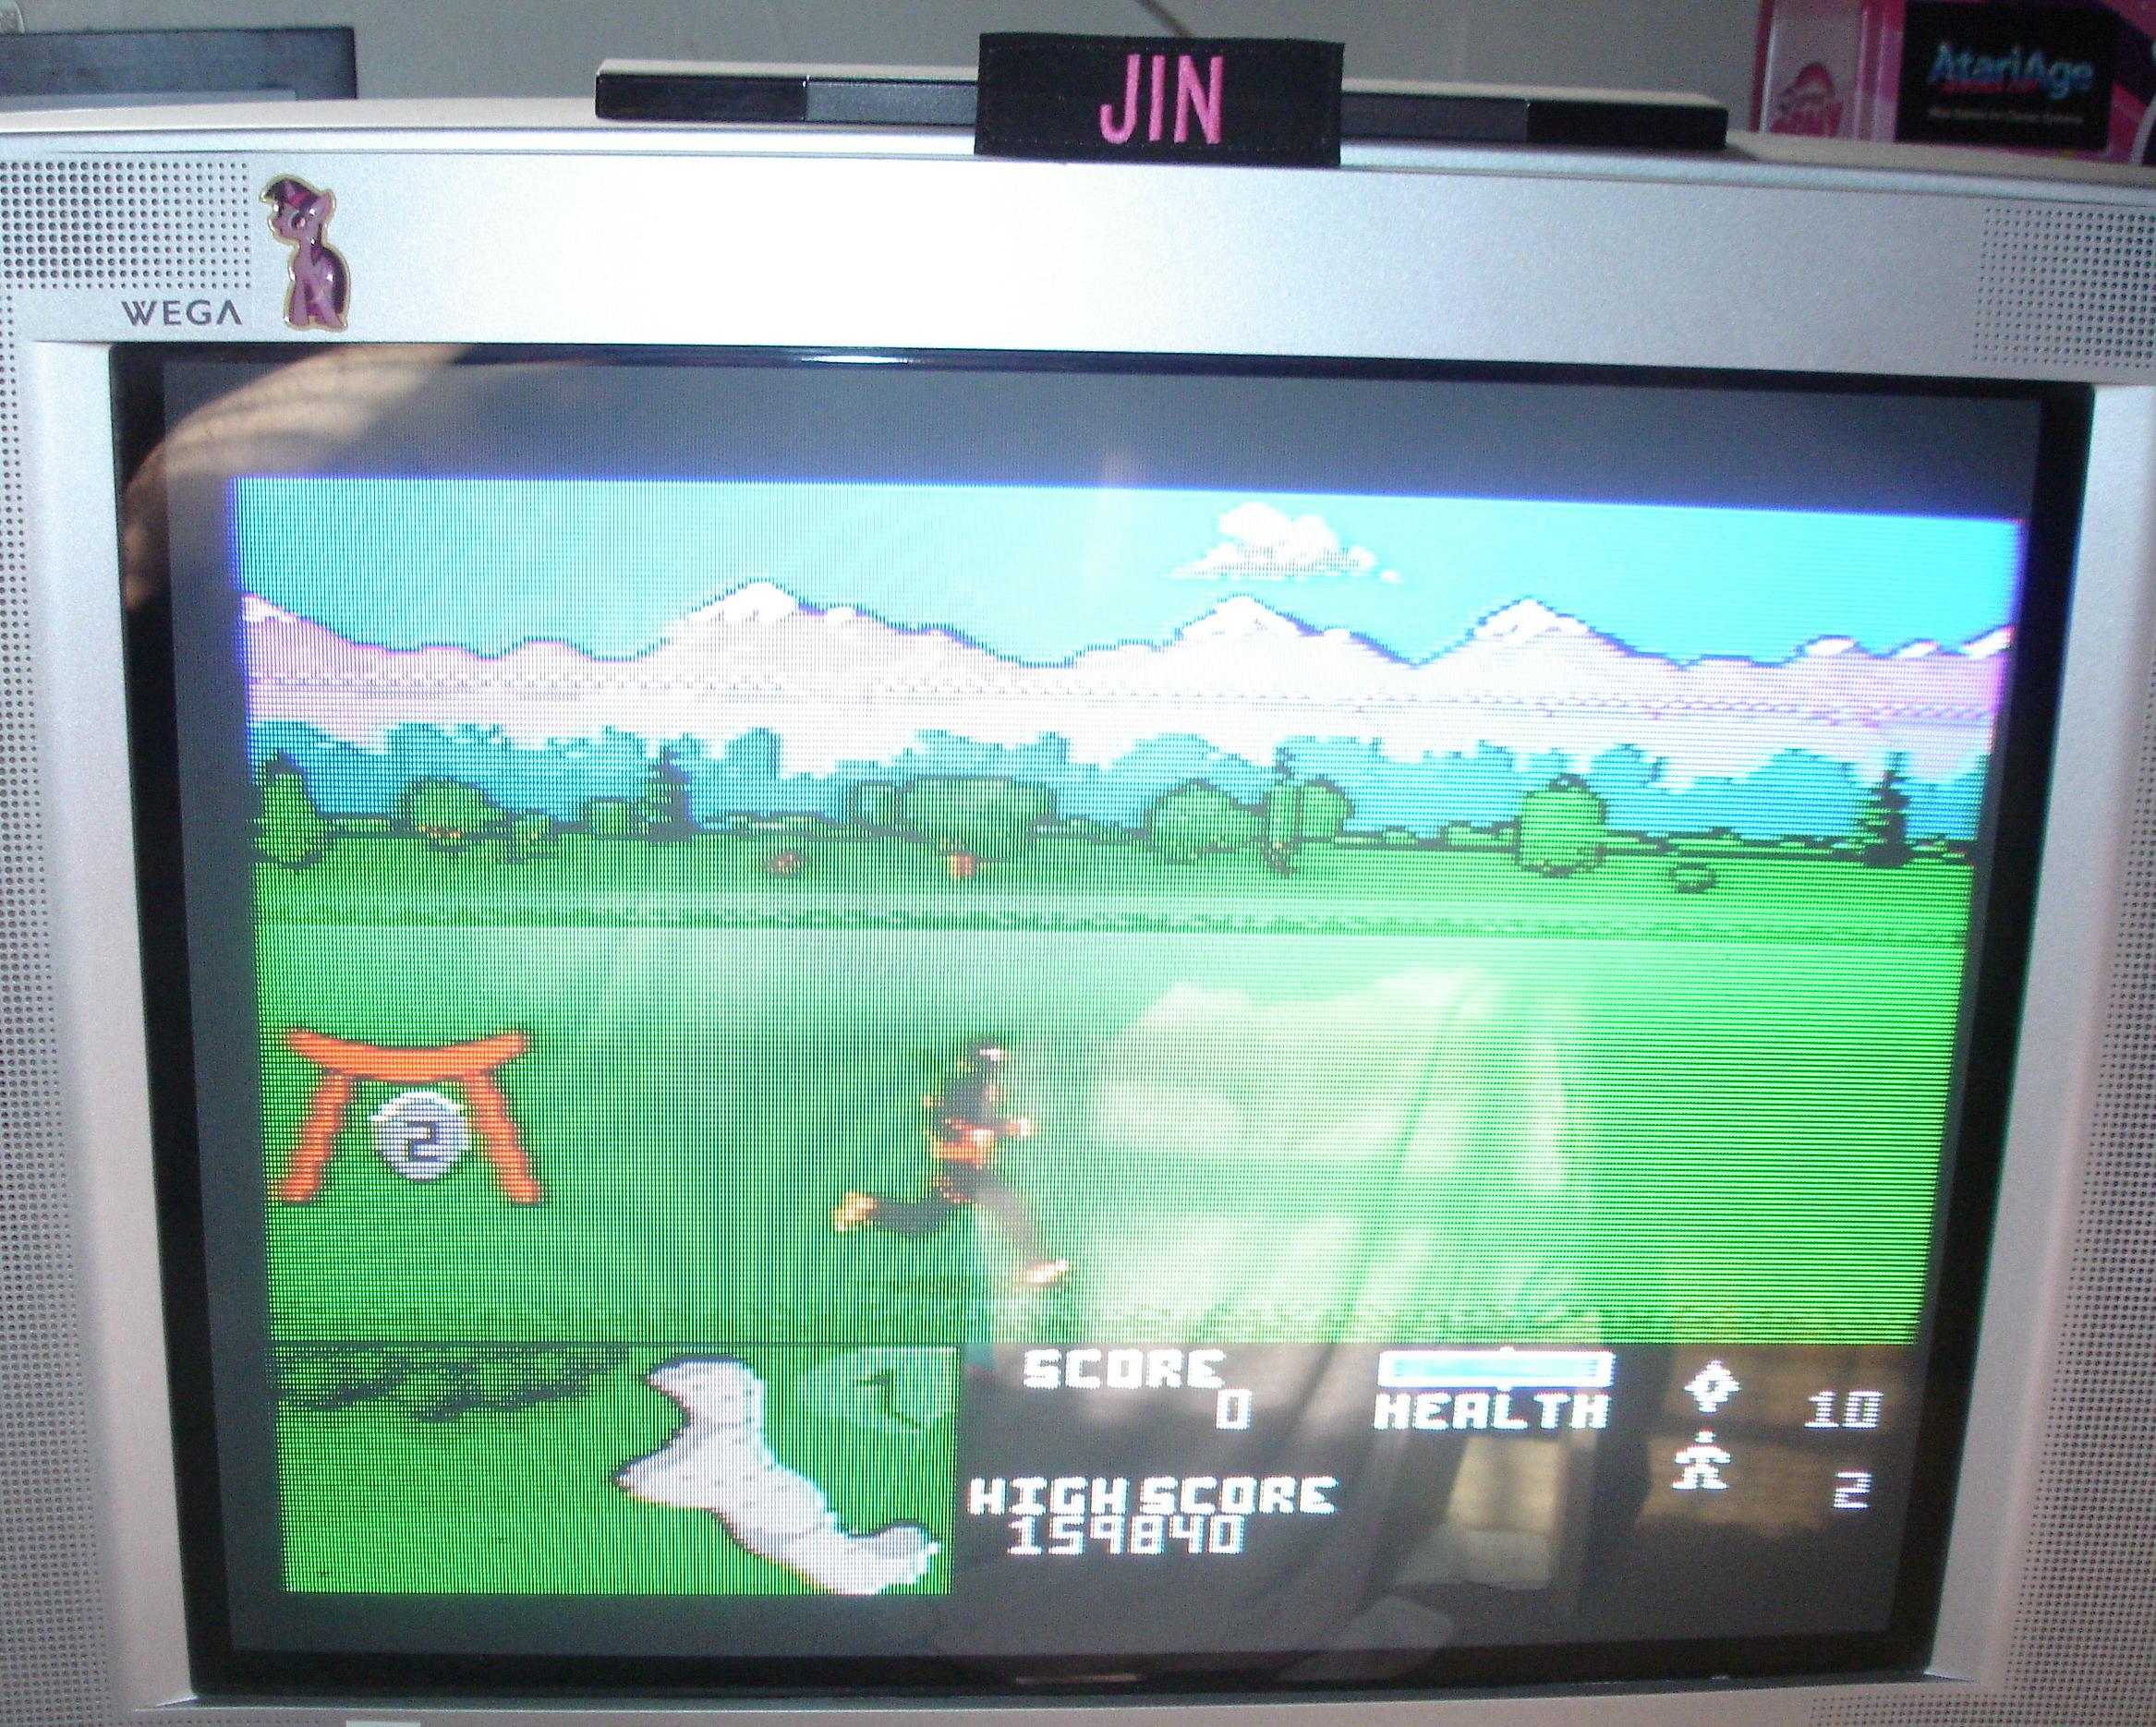 Ninja Golf: Normal 159,840 points